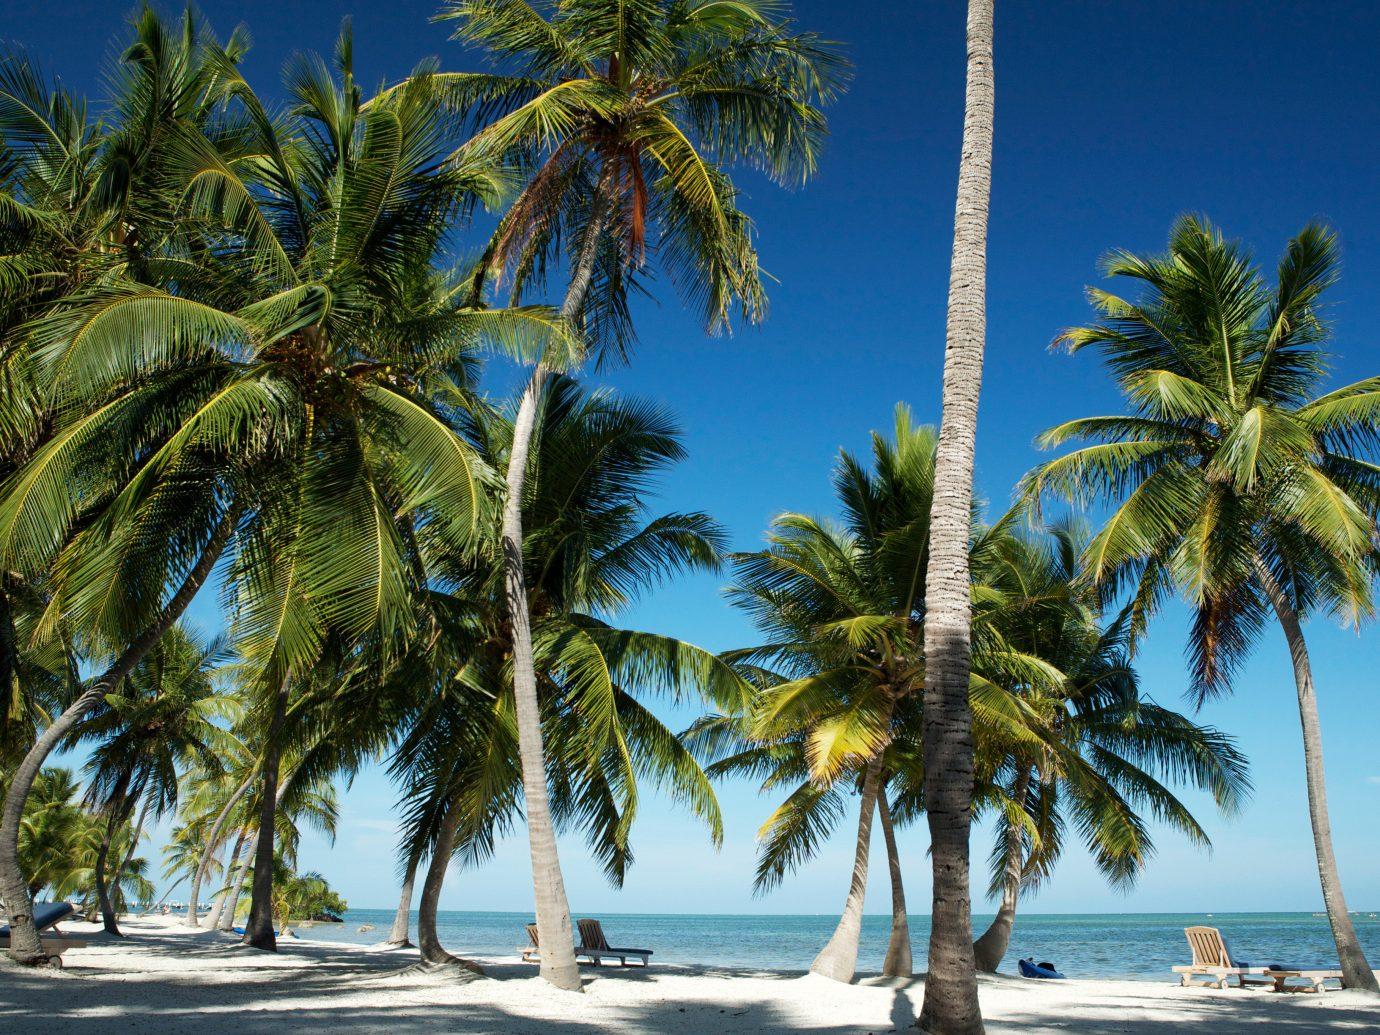 Beach Beachfront Luxury Play Resort Scenic views tree palm sky water plant palm family caribbean botany tropics Sea arecales woody plant Ocean land plant borassus flabellifer Coast lined flowering plant Island sandy shade